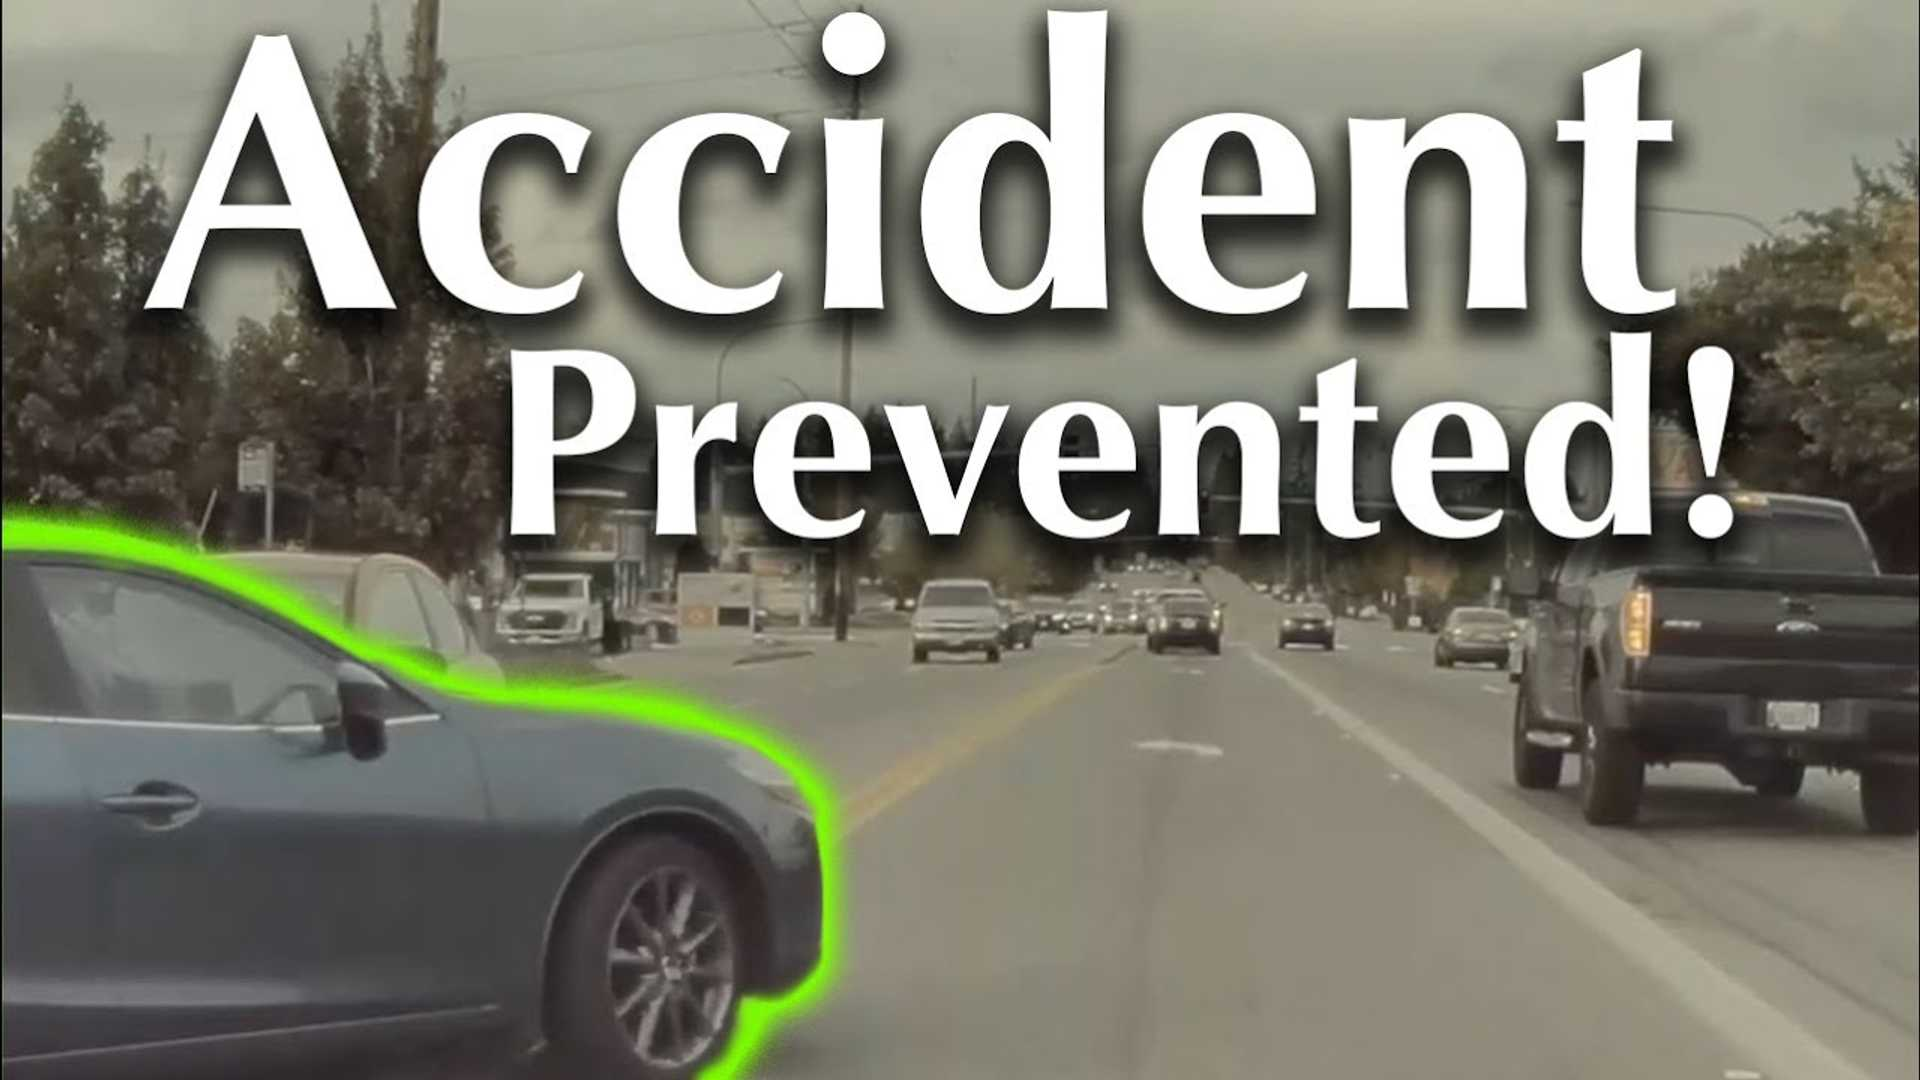 Tesla driver shares video of Autopilot preventing a crash